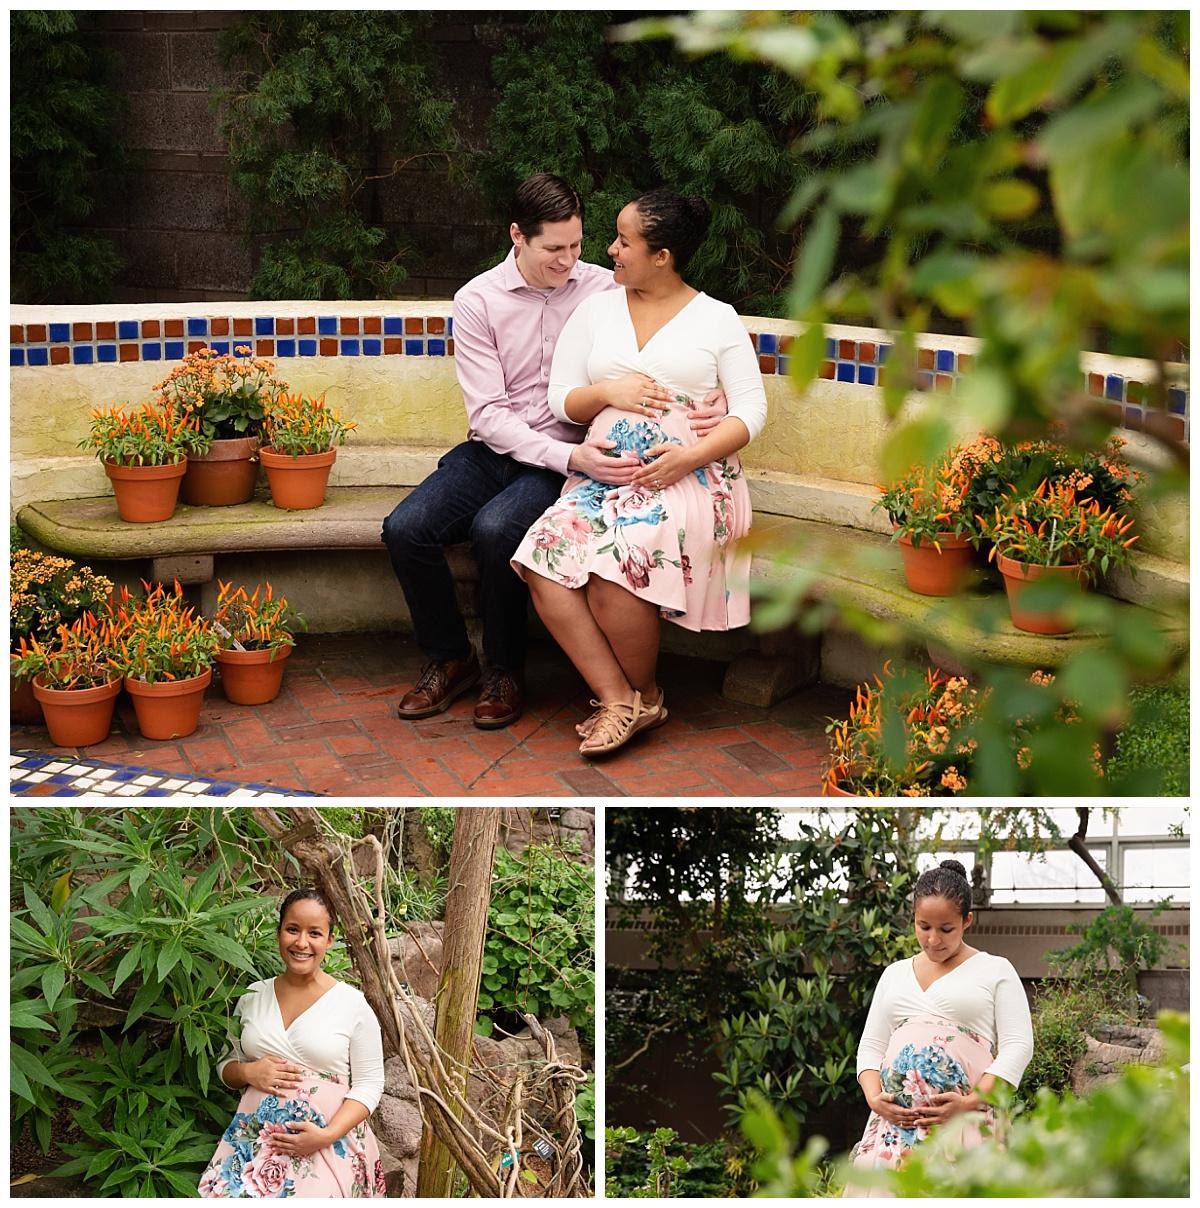 st-louis-maternity-photographer-at-missouri-botanical-gardens-mobot.jpg